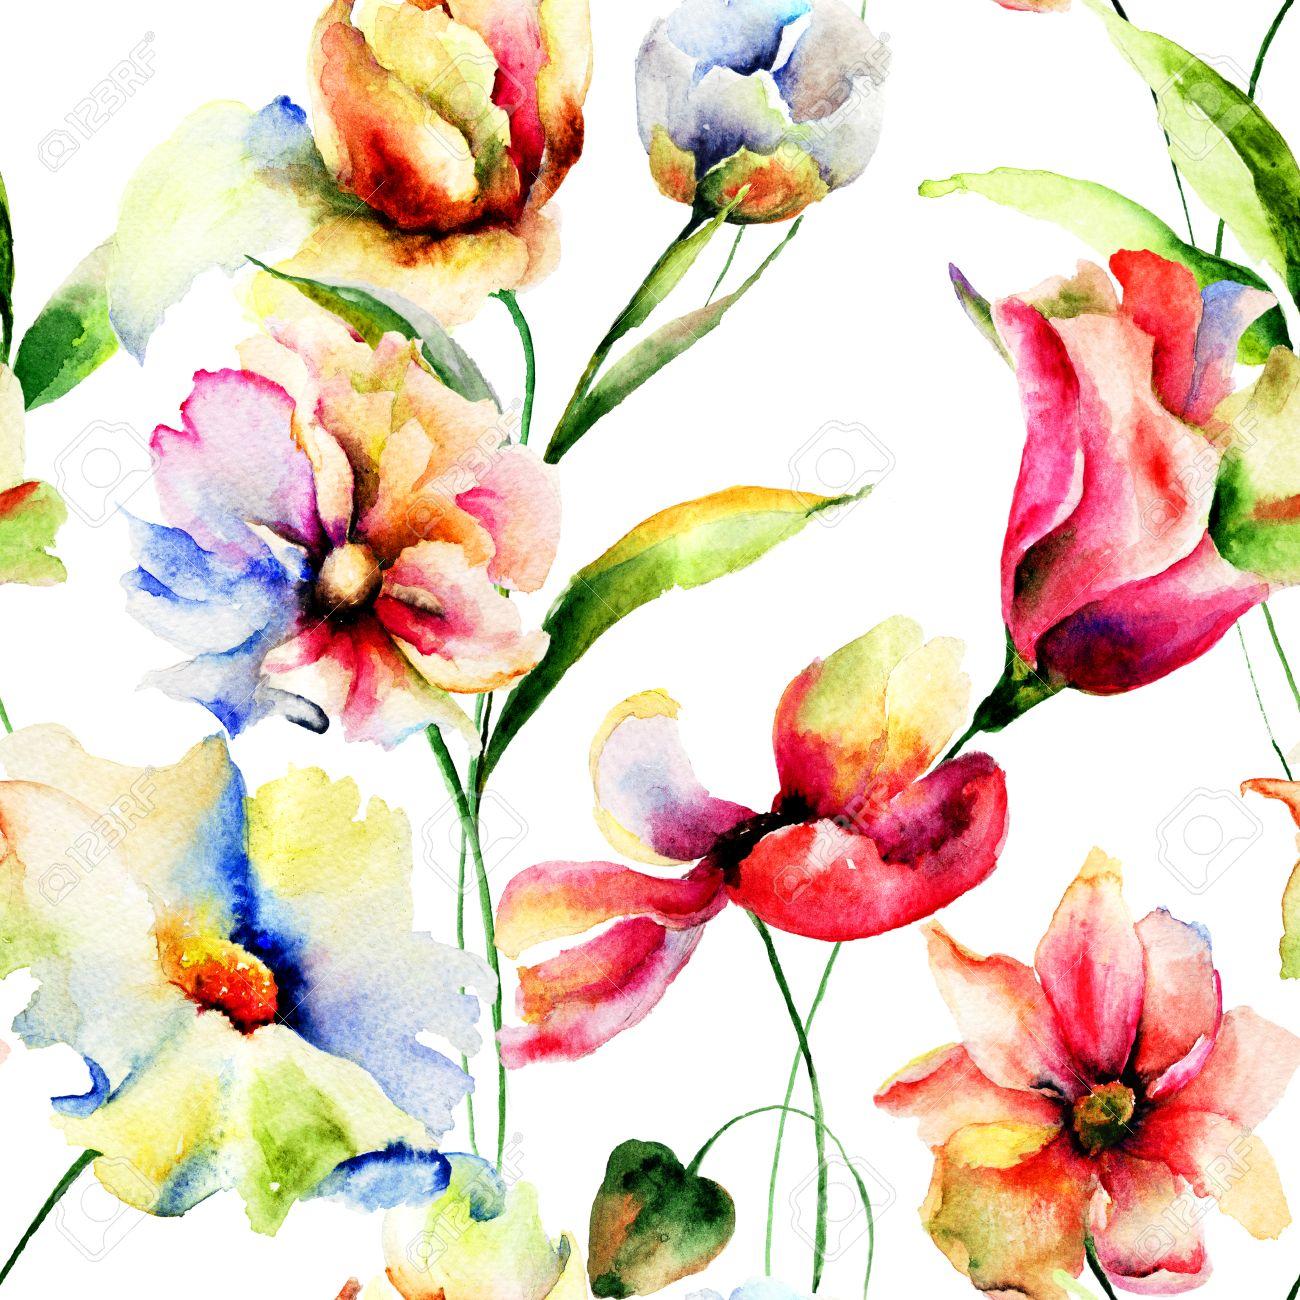 Fondo De Pantalla Transparente Con Flores De Primavera Pintura De